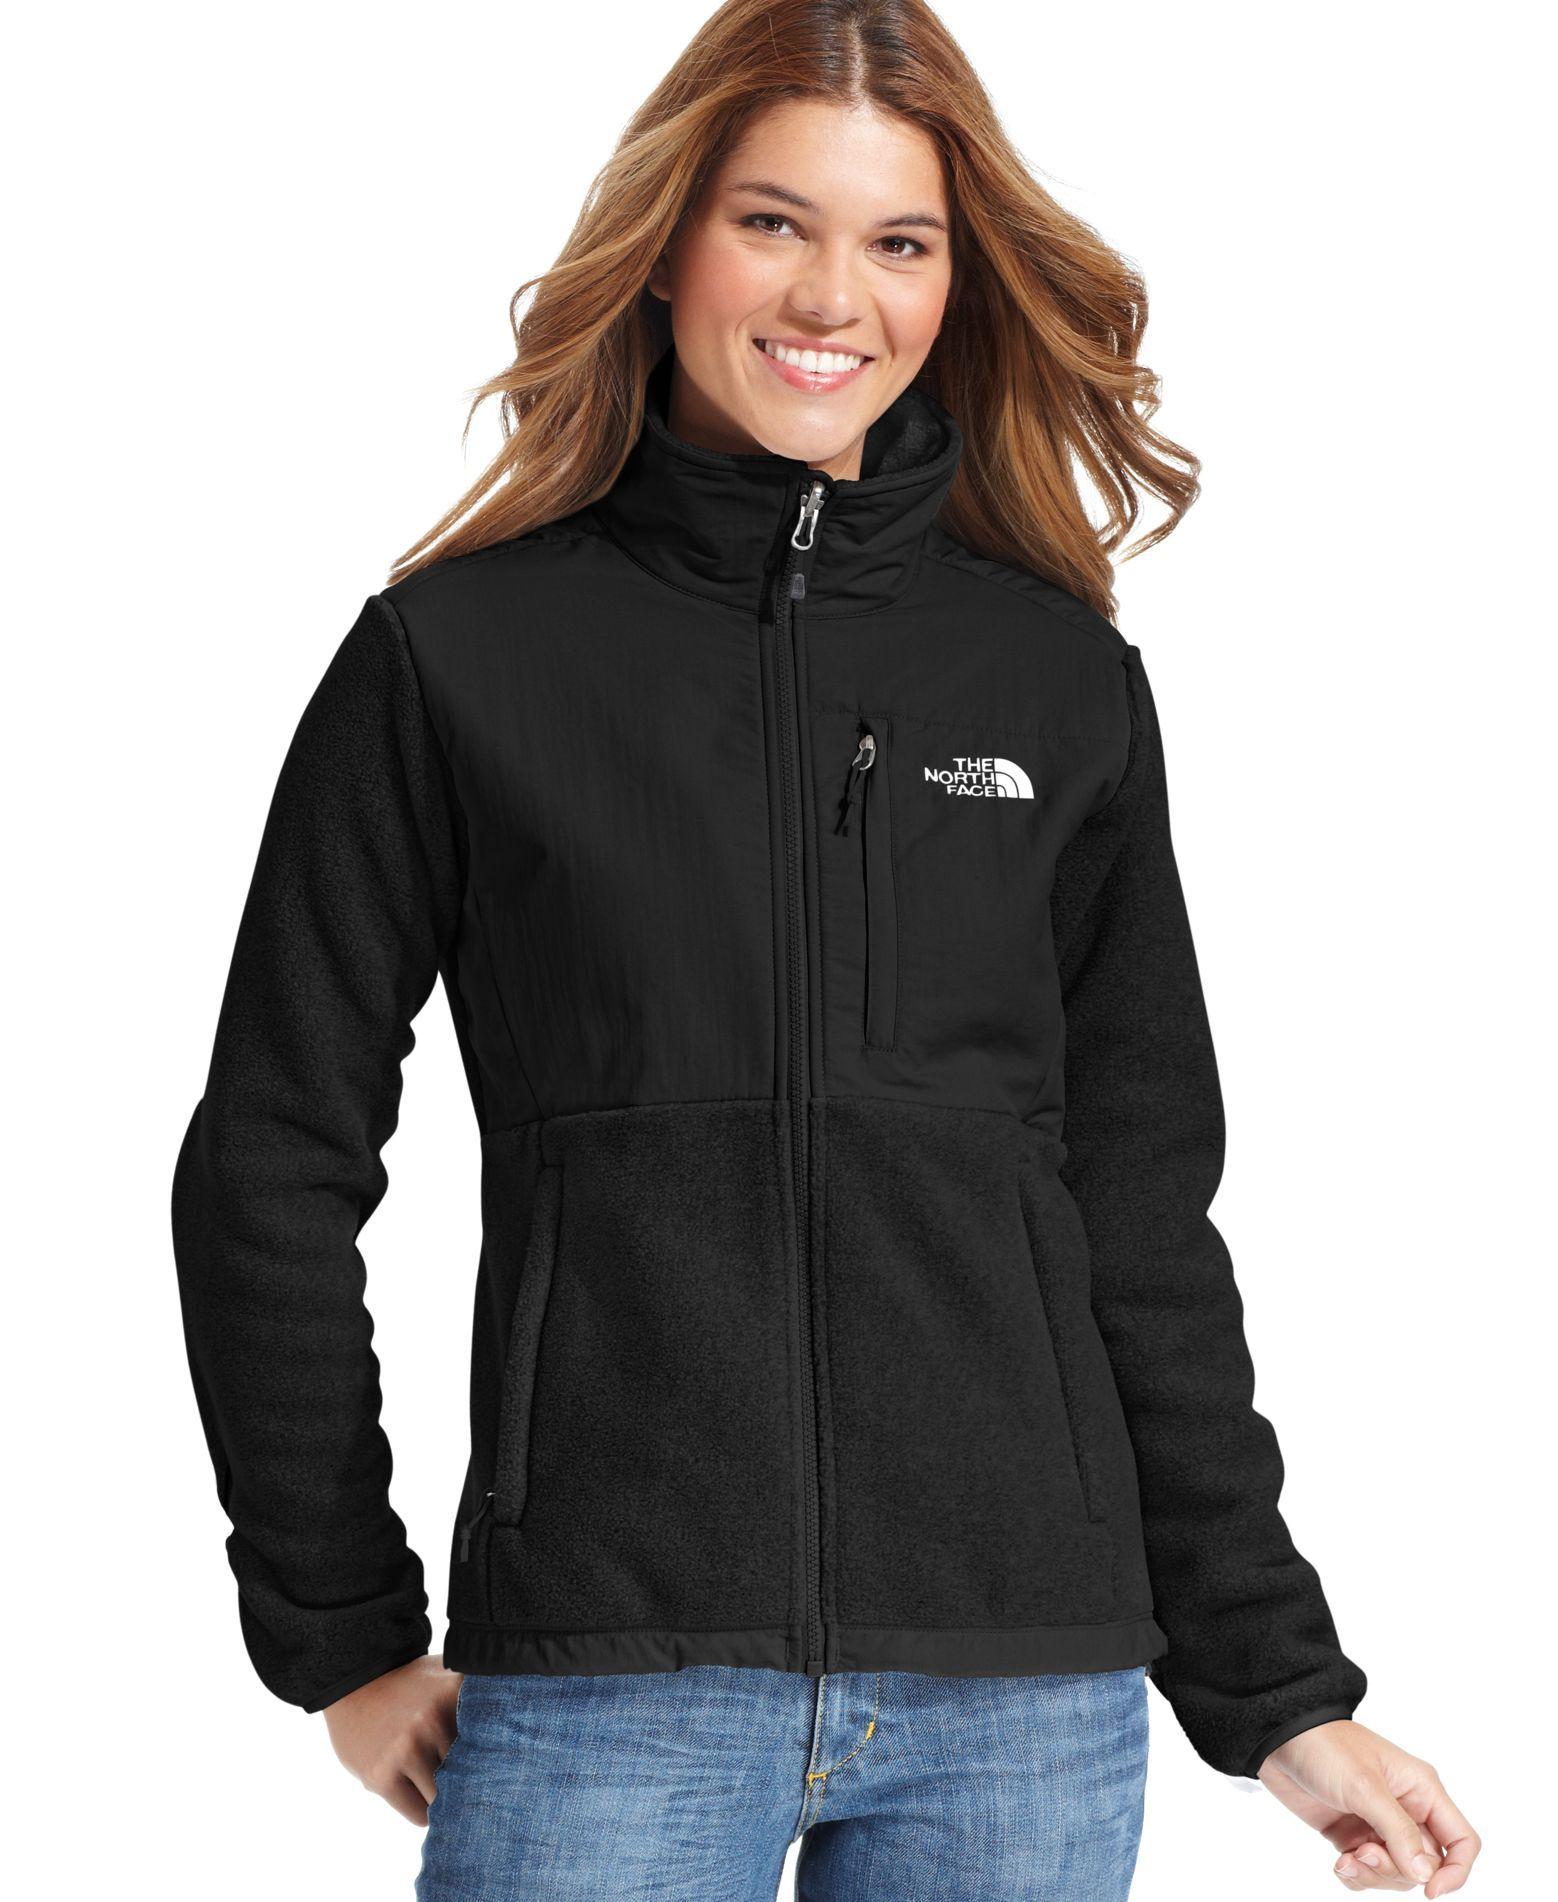 d552d1aa3 coupon for north face jacket macys 0c308 73d3e